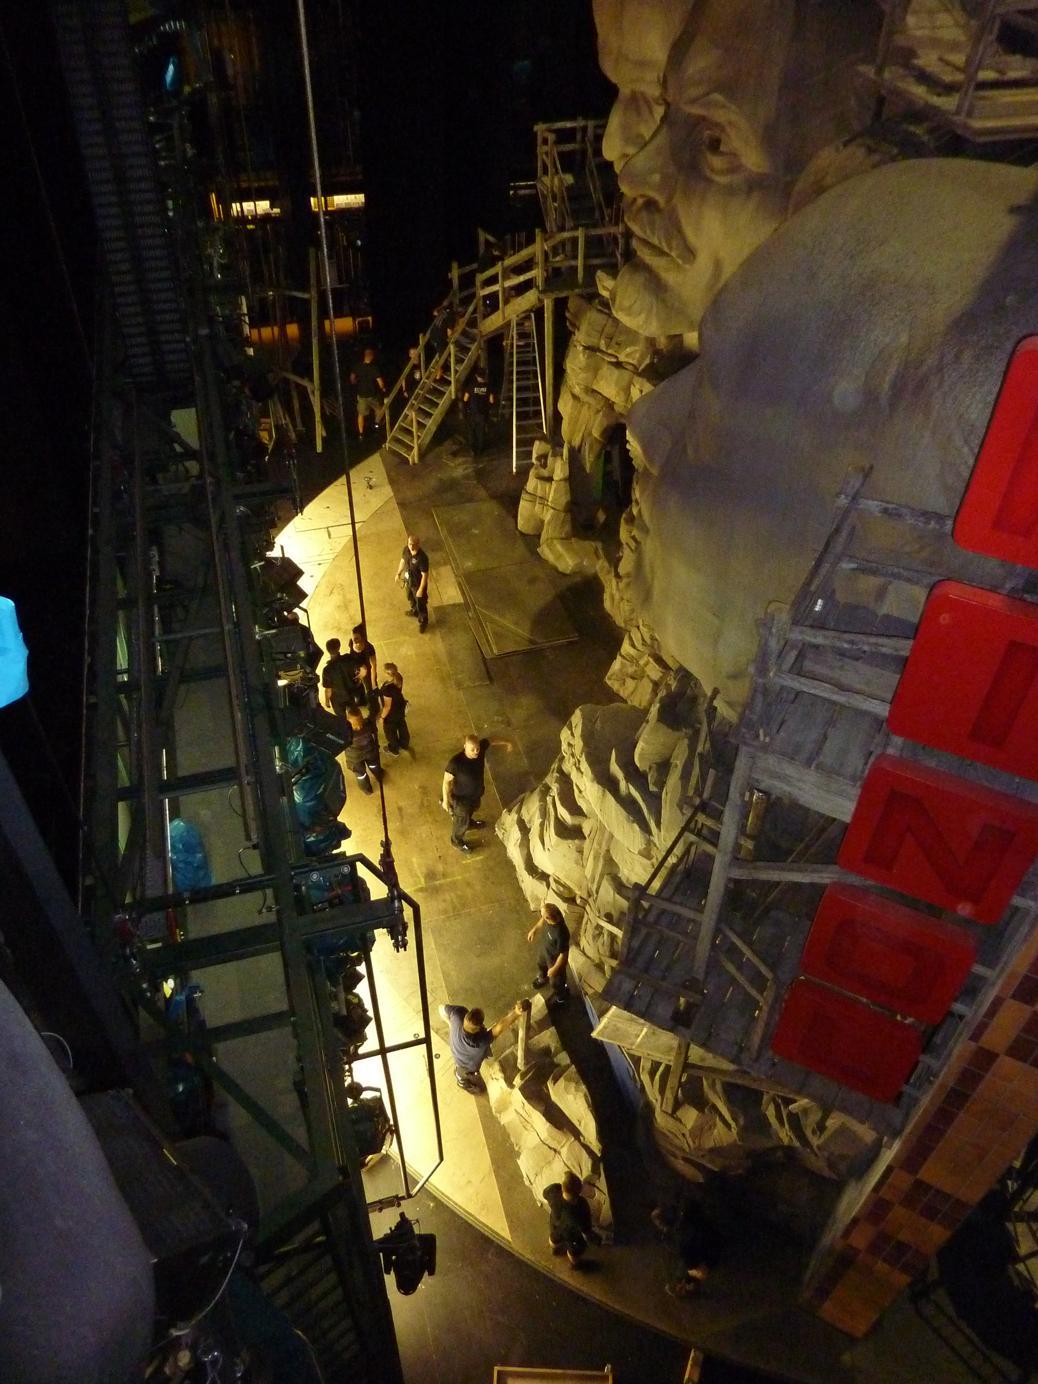 Abbau Mount Rushmore Siegfried 2015 ©Monika Gora